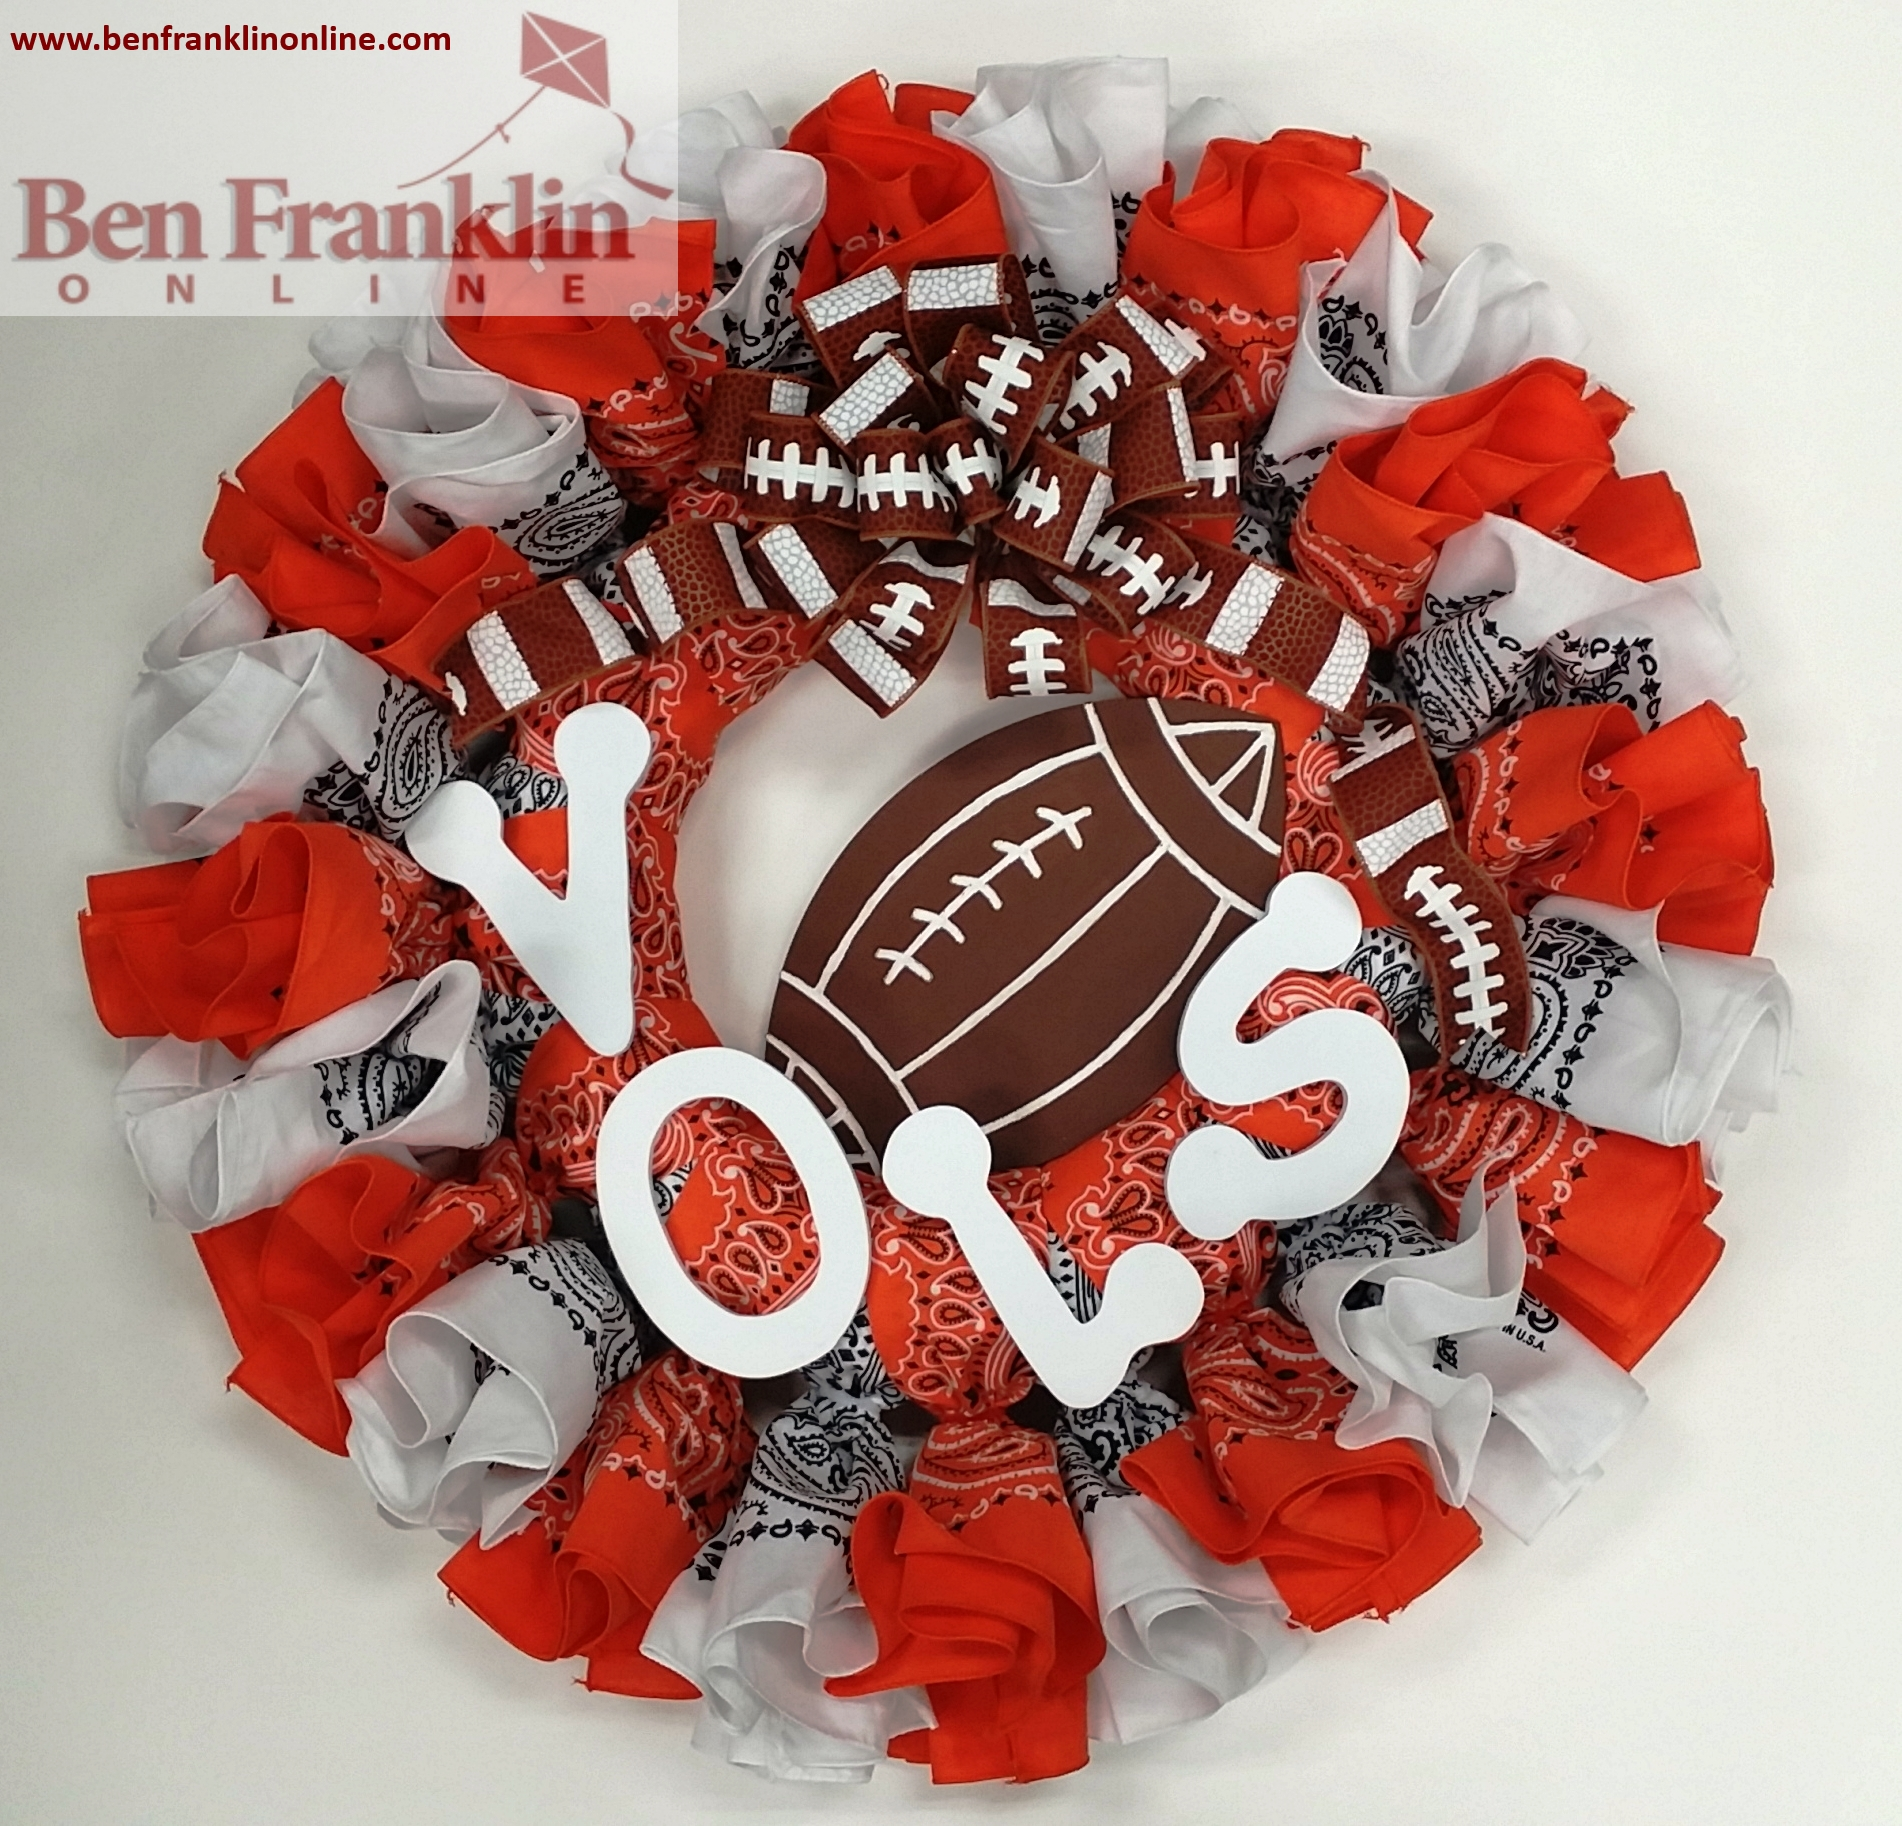 vols-bandana-wreath.jpg